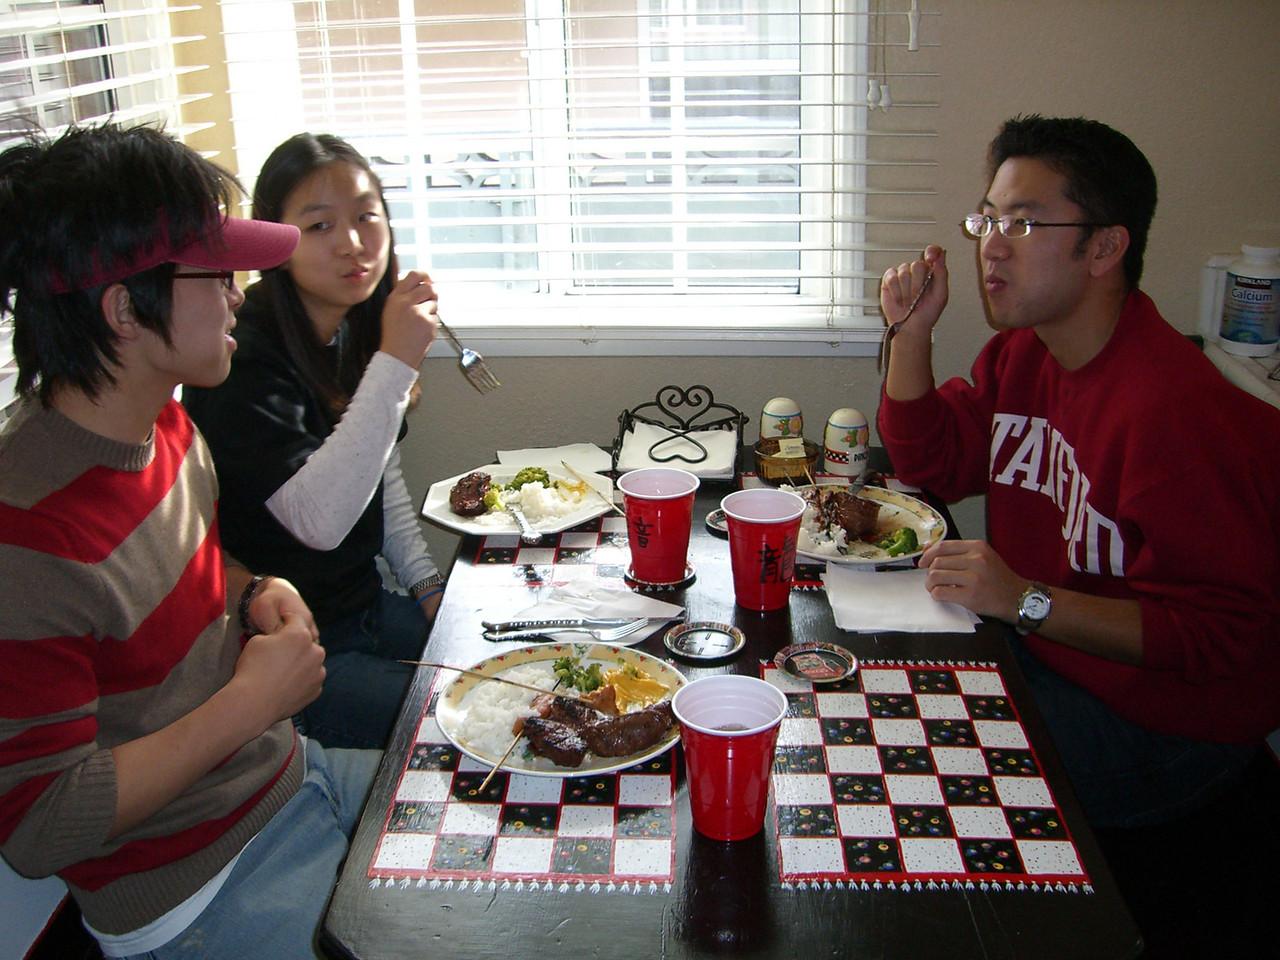 2005 12 18 Sun - Lake Ave Church - Hyungsoo Kim, Jenny Alyono, & Bryan Lung grub